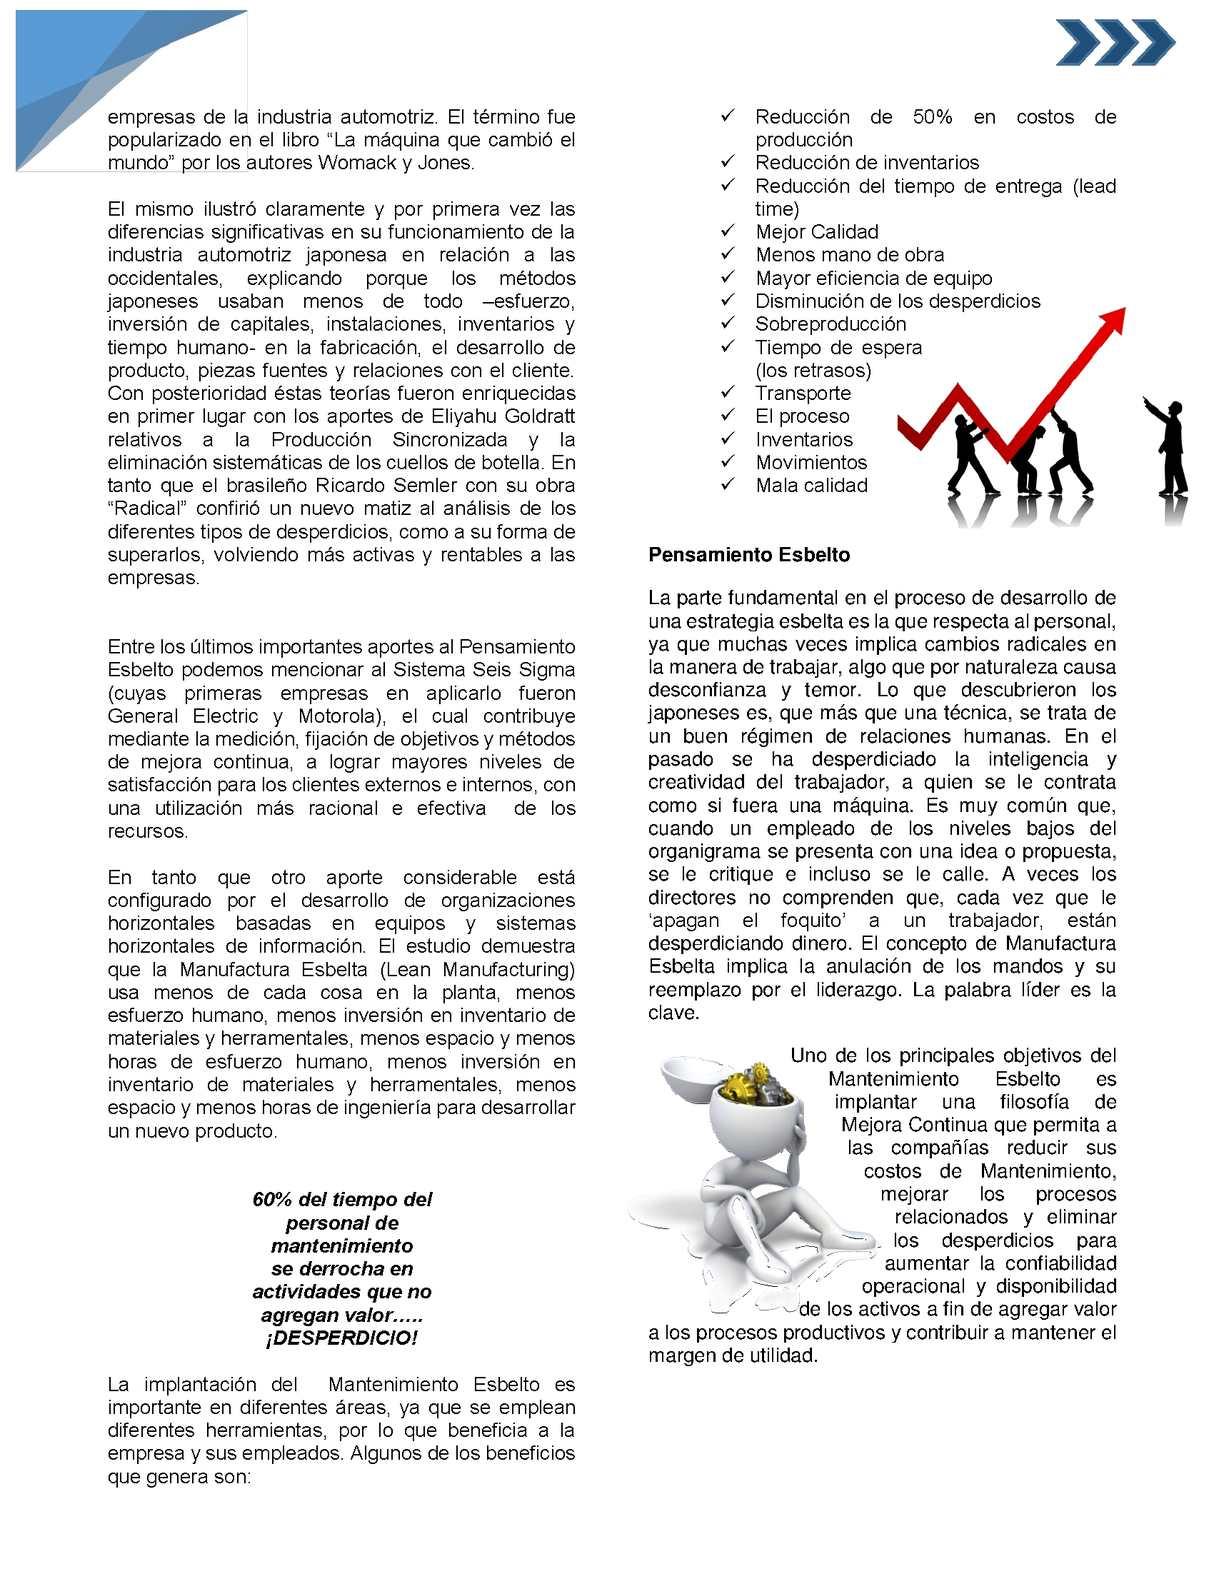 Revista Mantenimiento - CALAMEO Downloader